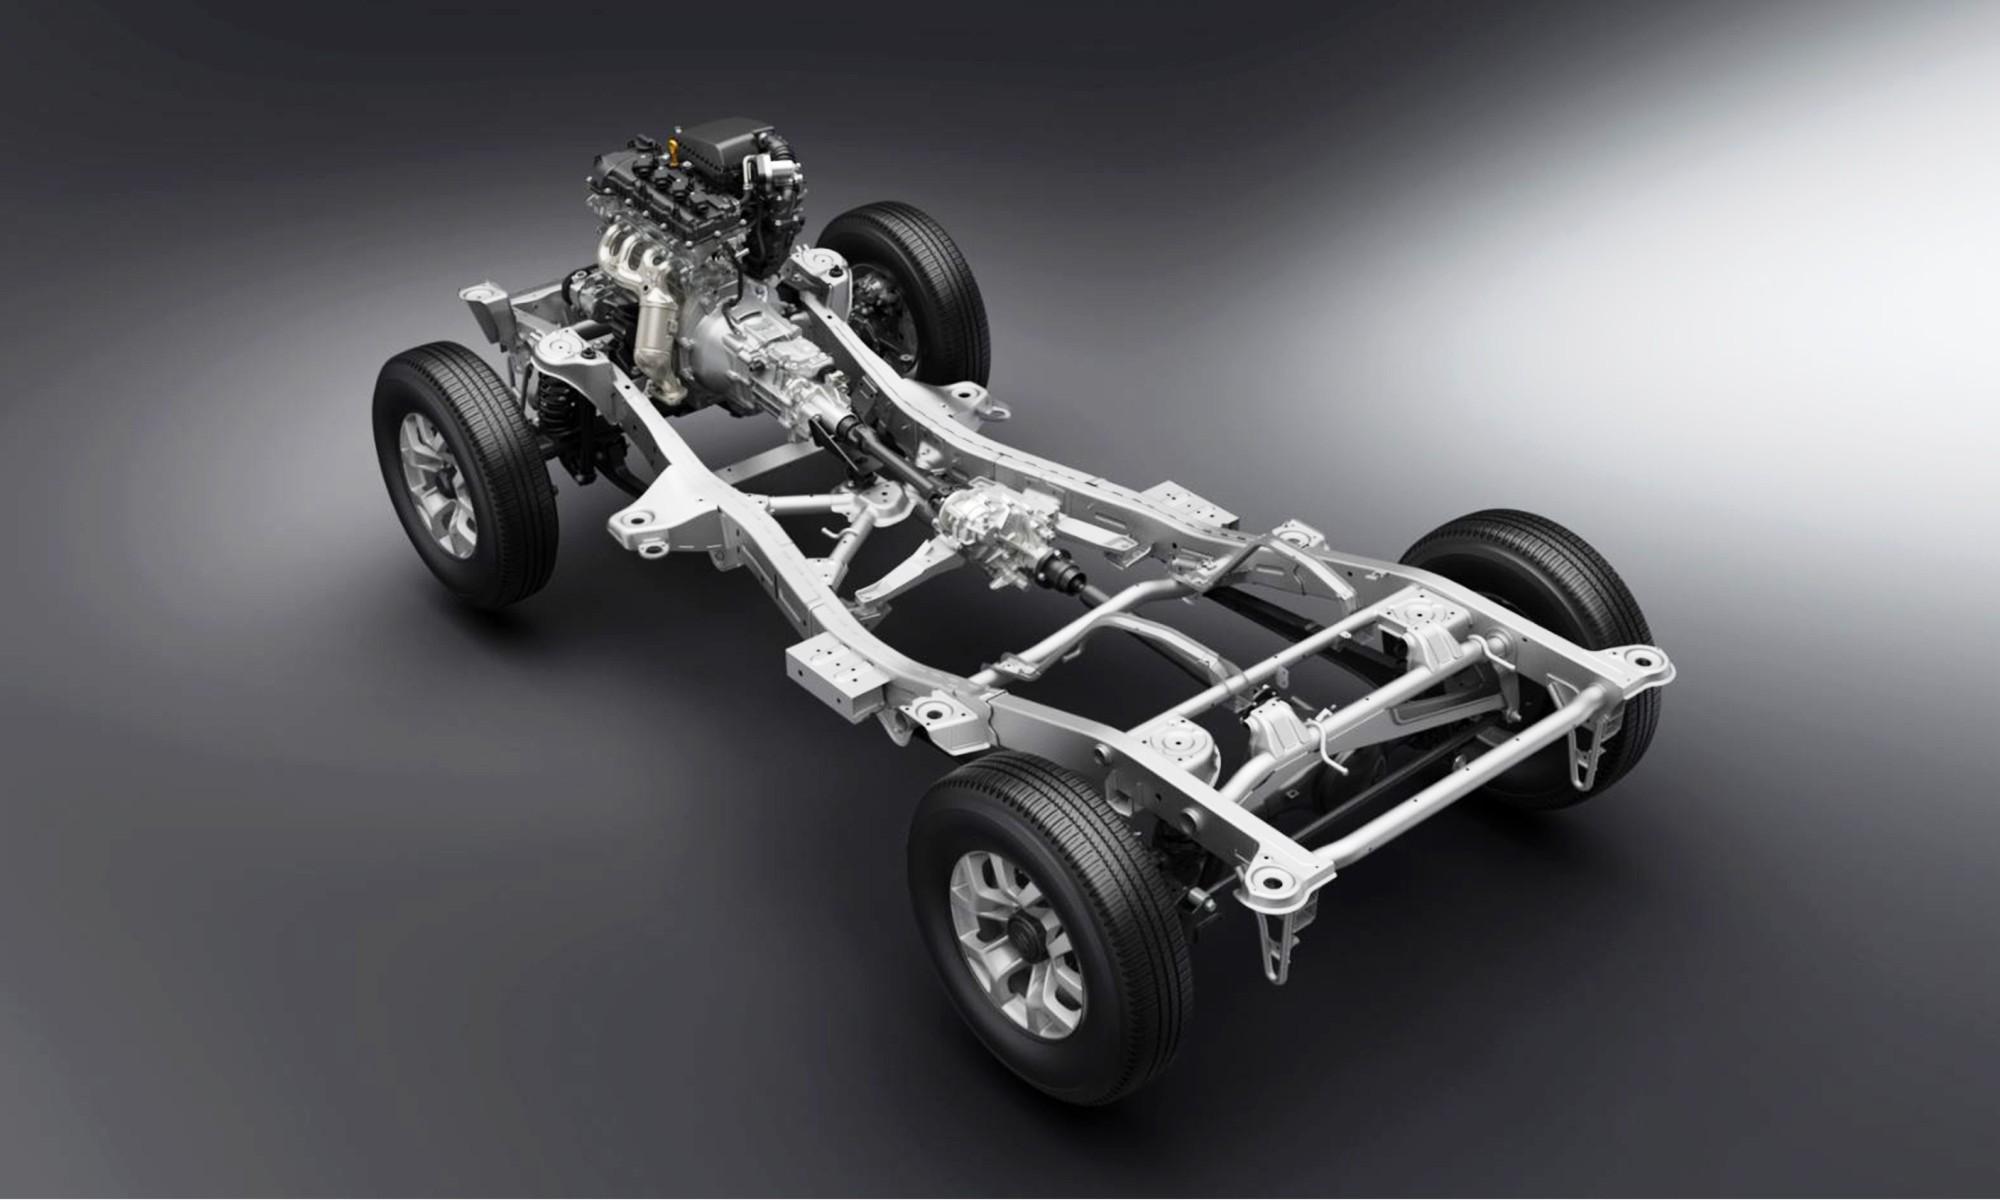 New Suzuki Jimny chassis